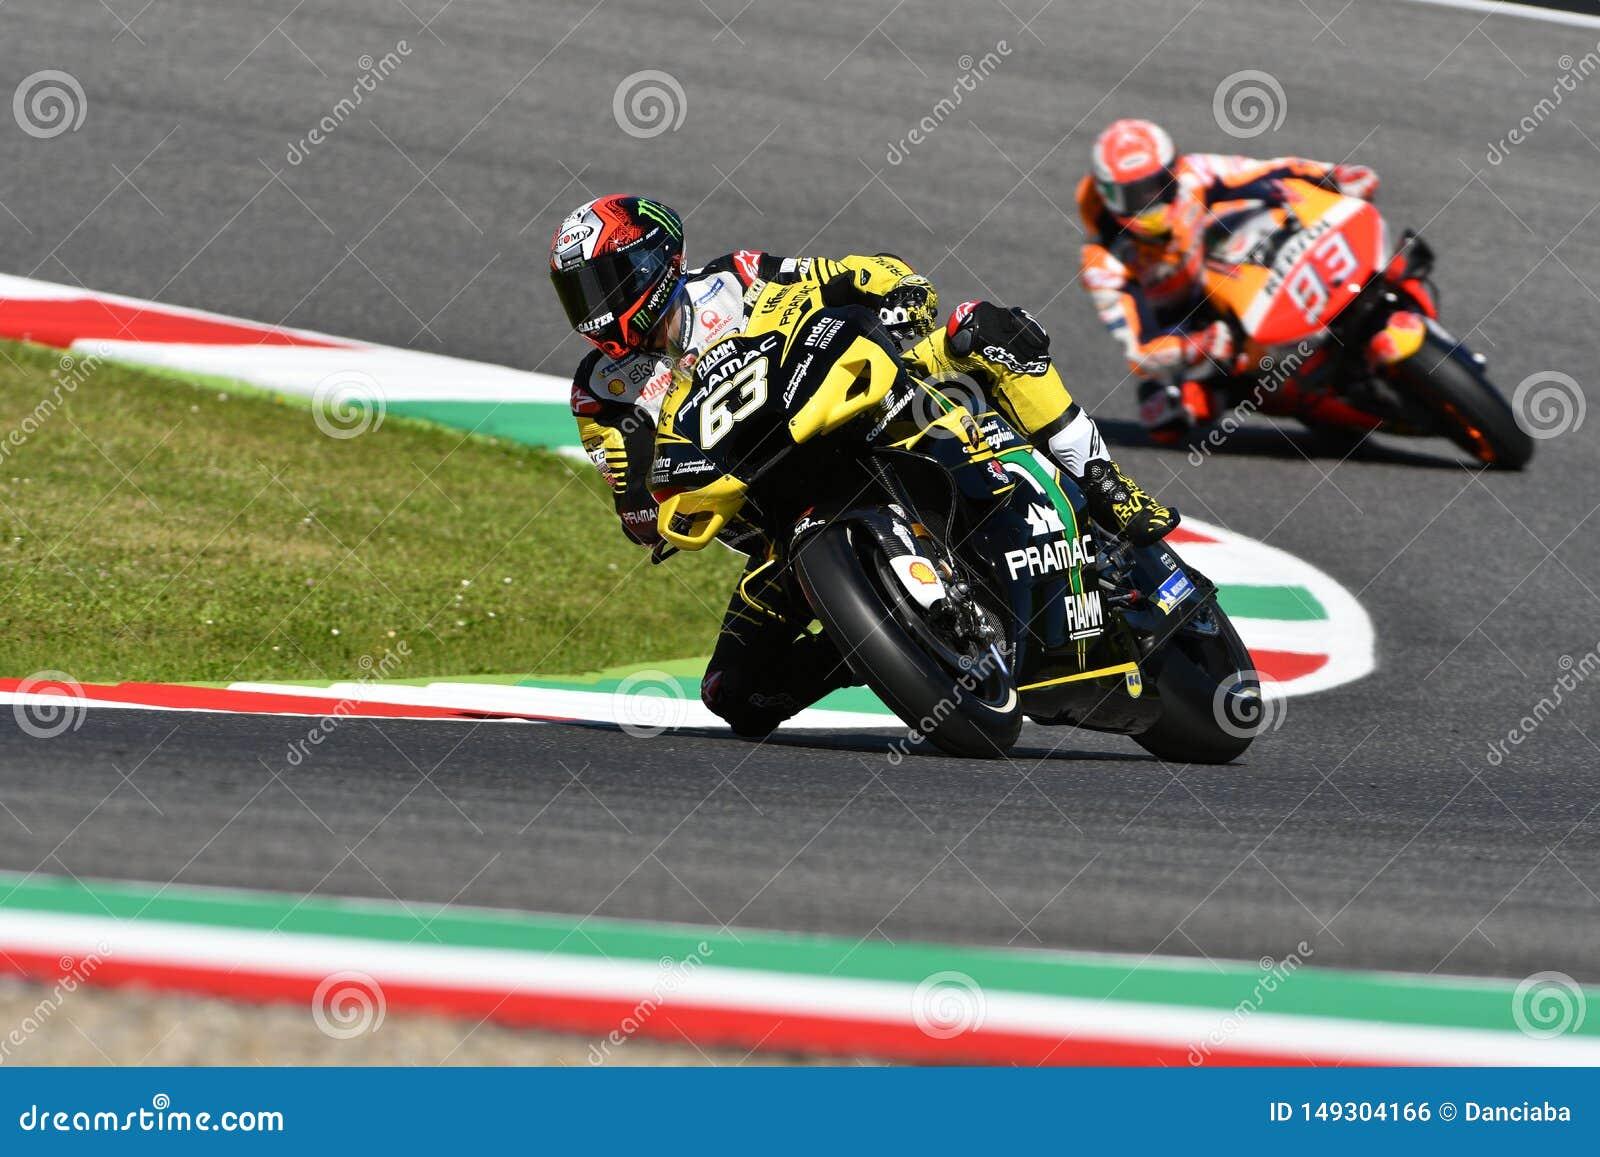 Mugello - ITALY, 30 May 2019: Italian Ducati Alma Pramac Team Rider Francesco  Bagnaia In Action At 2019 GP Of Italy Of MotoGP Editorial Photo - Image of  ducati, championship: 149304166